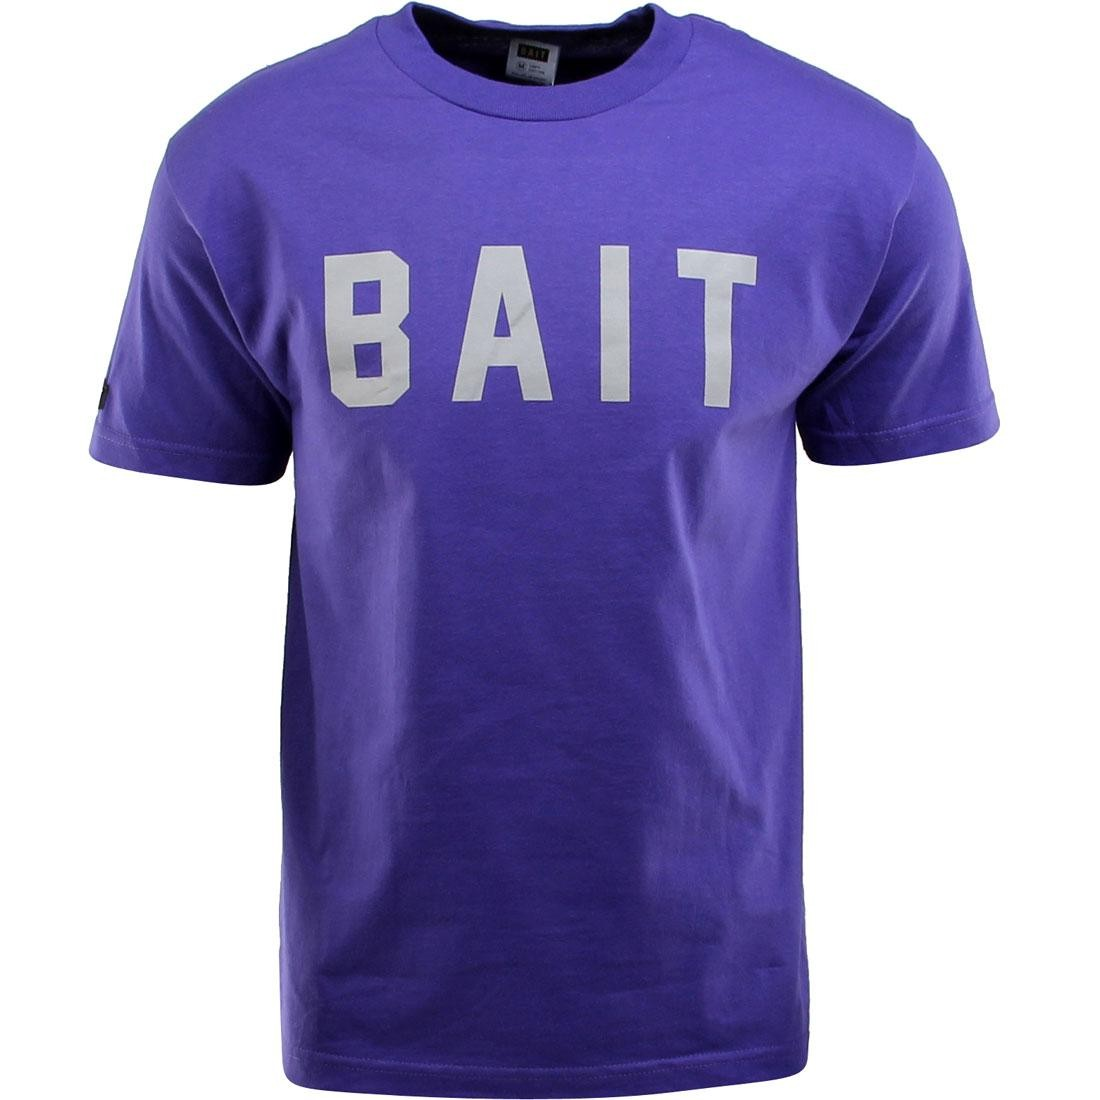 BAIT Logo Tee (purple / gray)